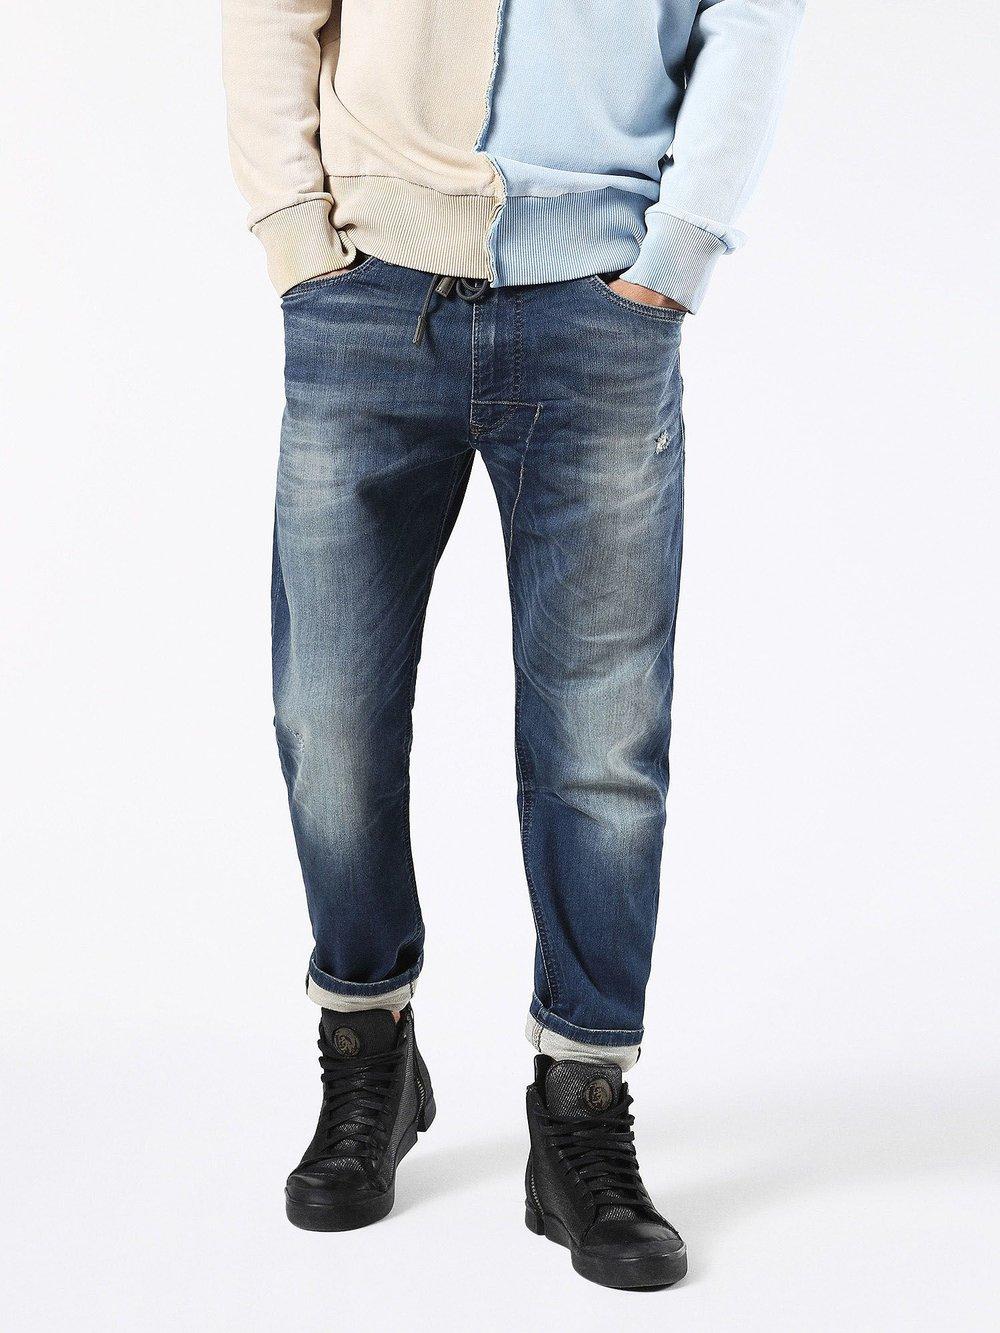 diesel_jogg_jeans_narrot_0857x